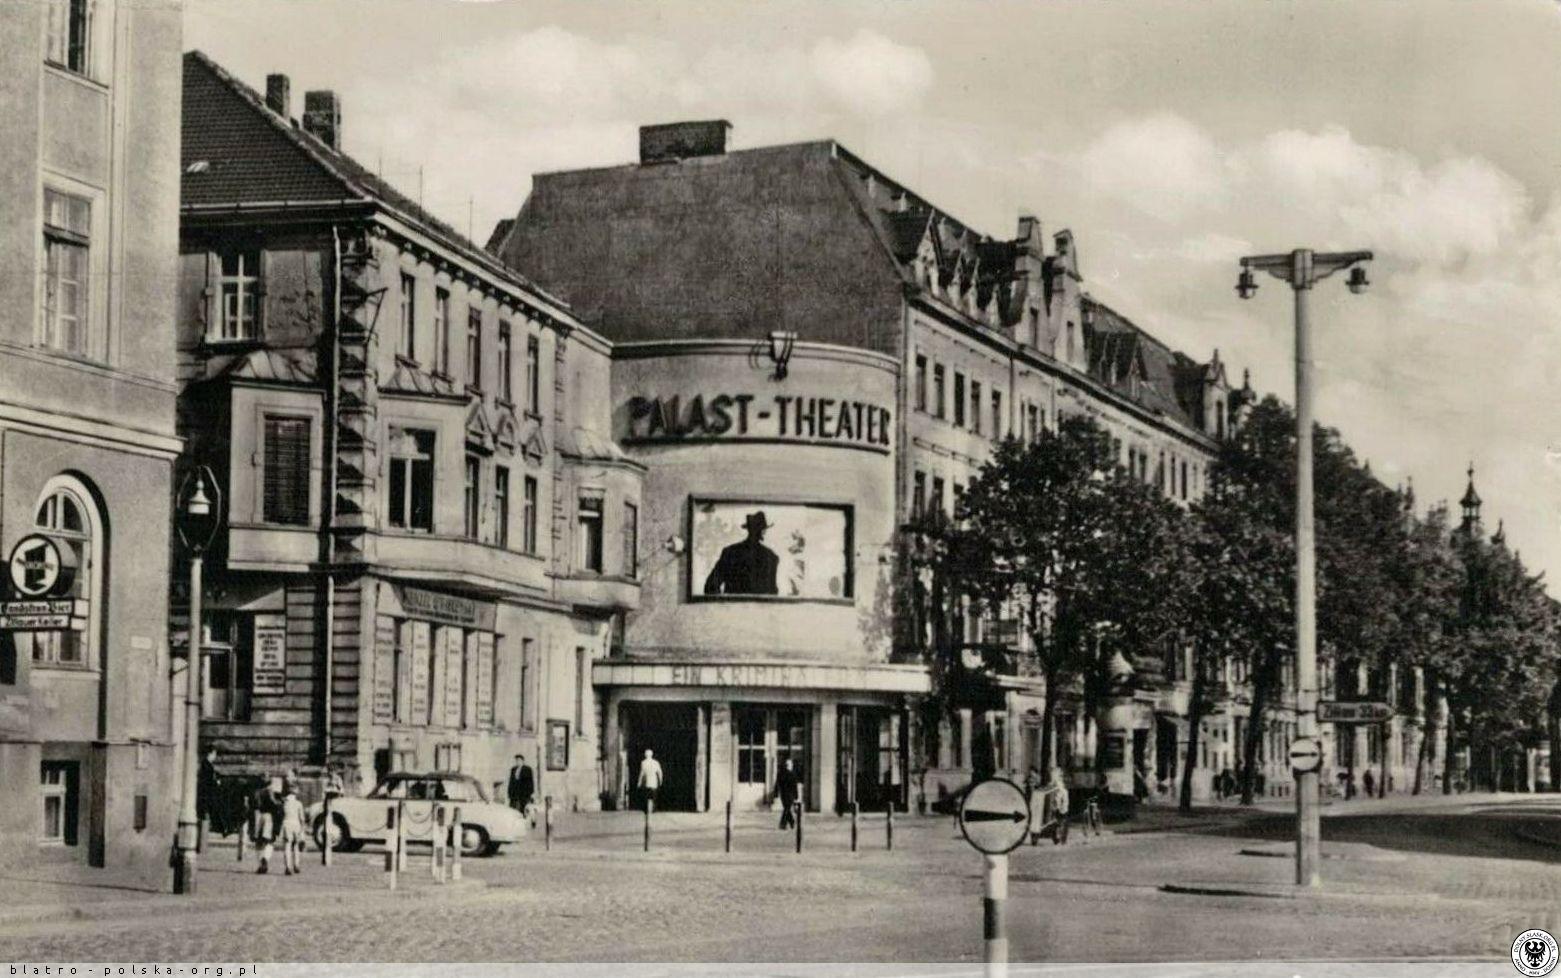 https://polska-org.pl/foto/6447/Film_Palast_Theater_Palast_ul_Jakobstrae_Gorlitz_6447002.jpg